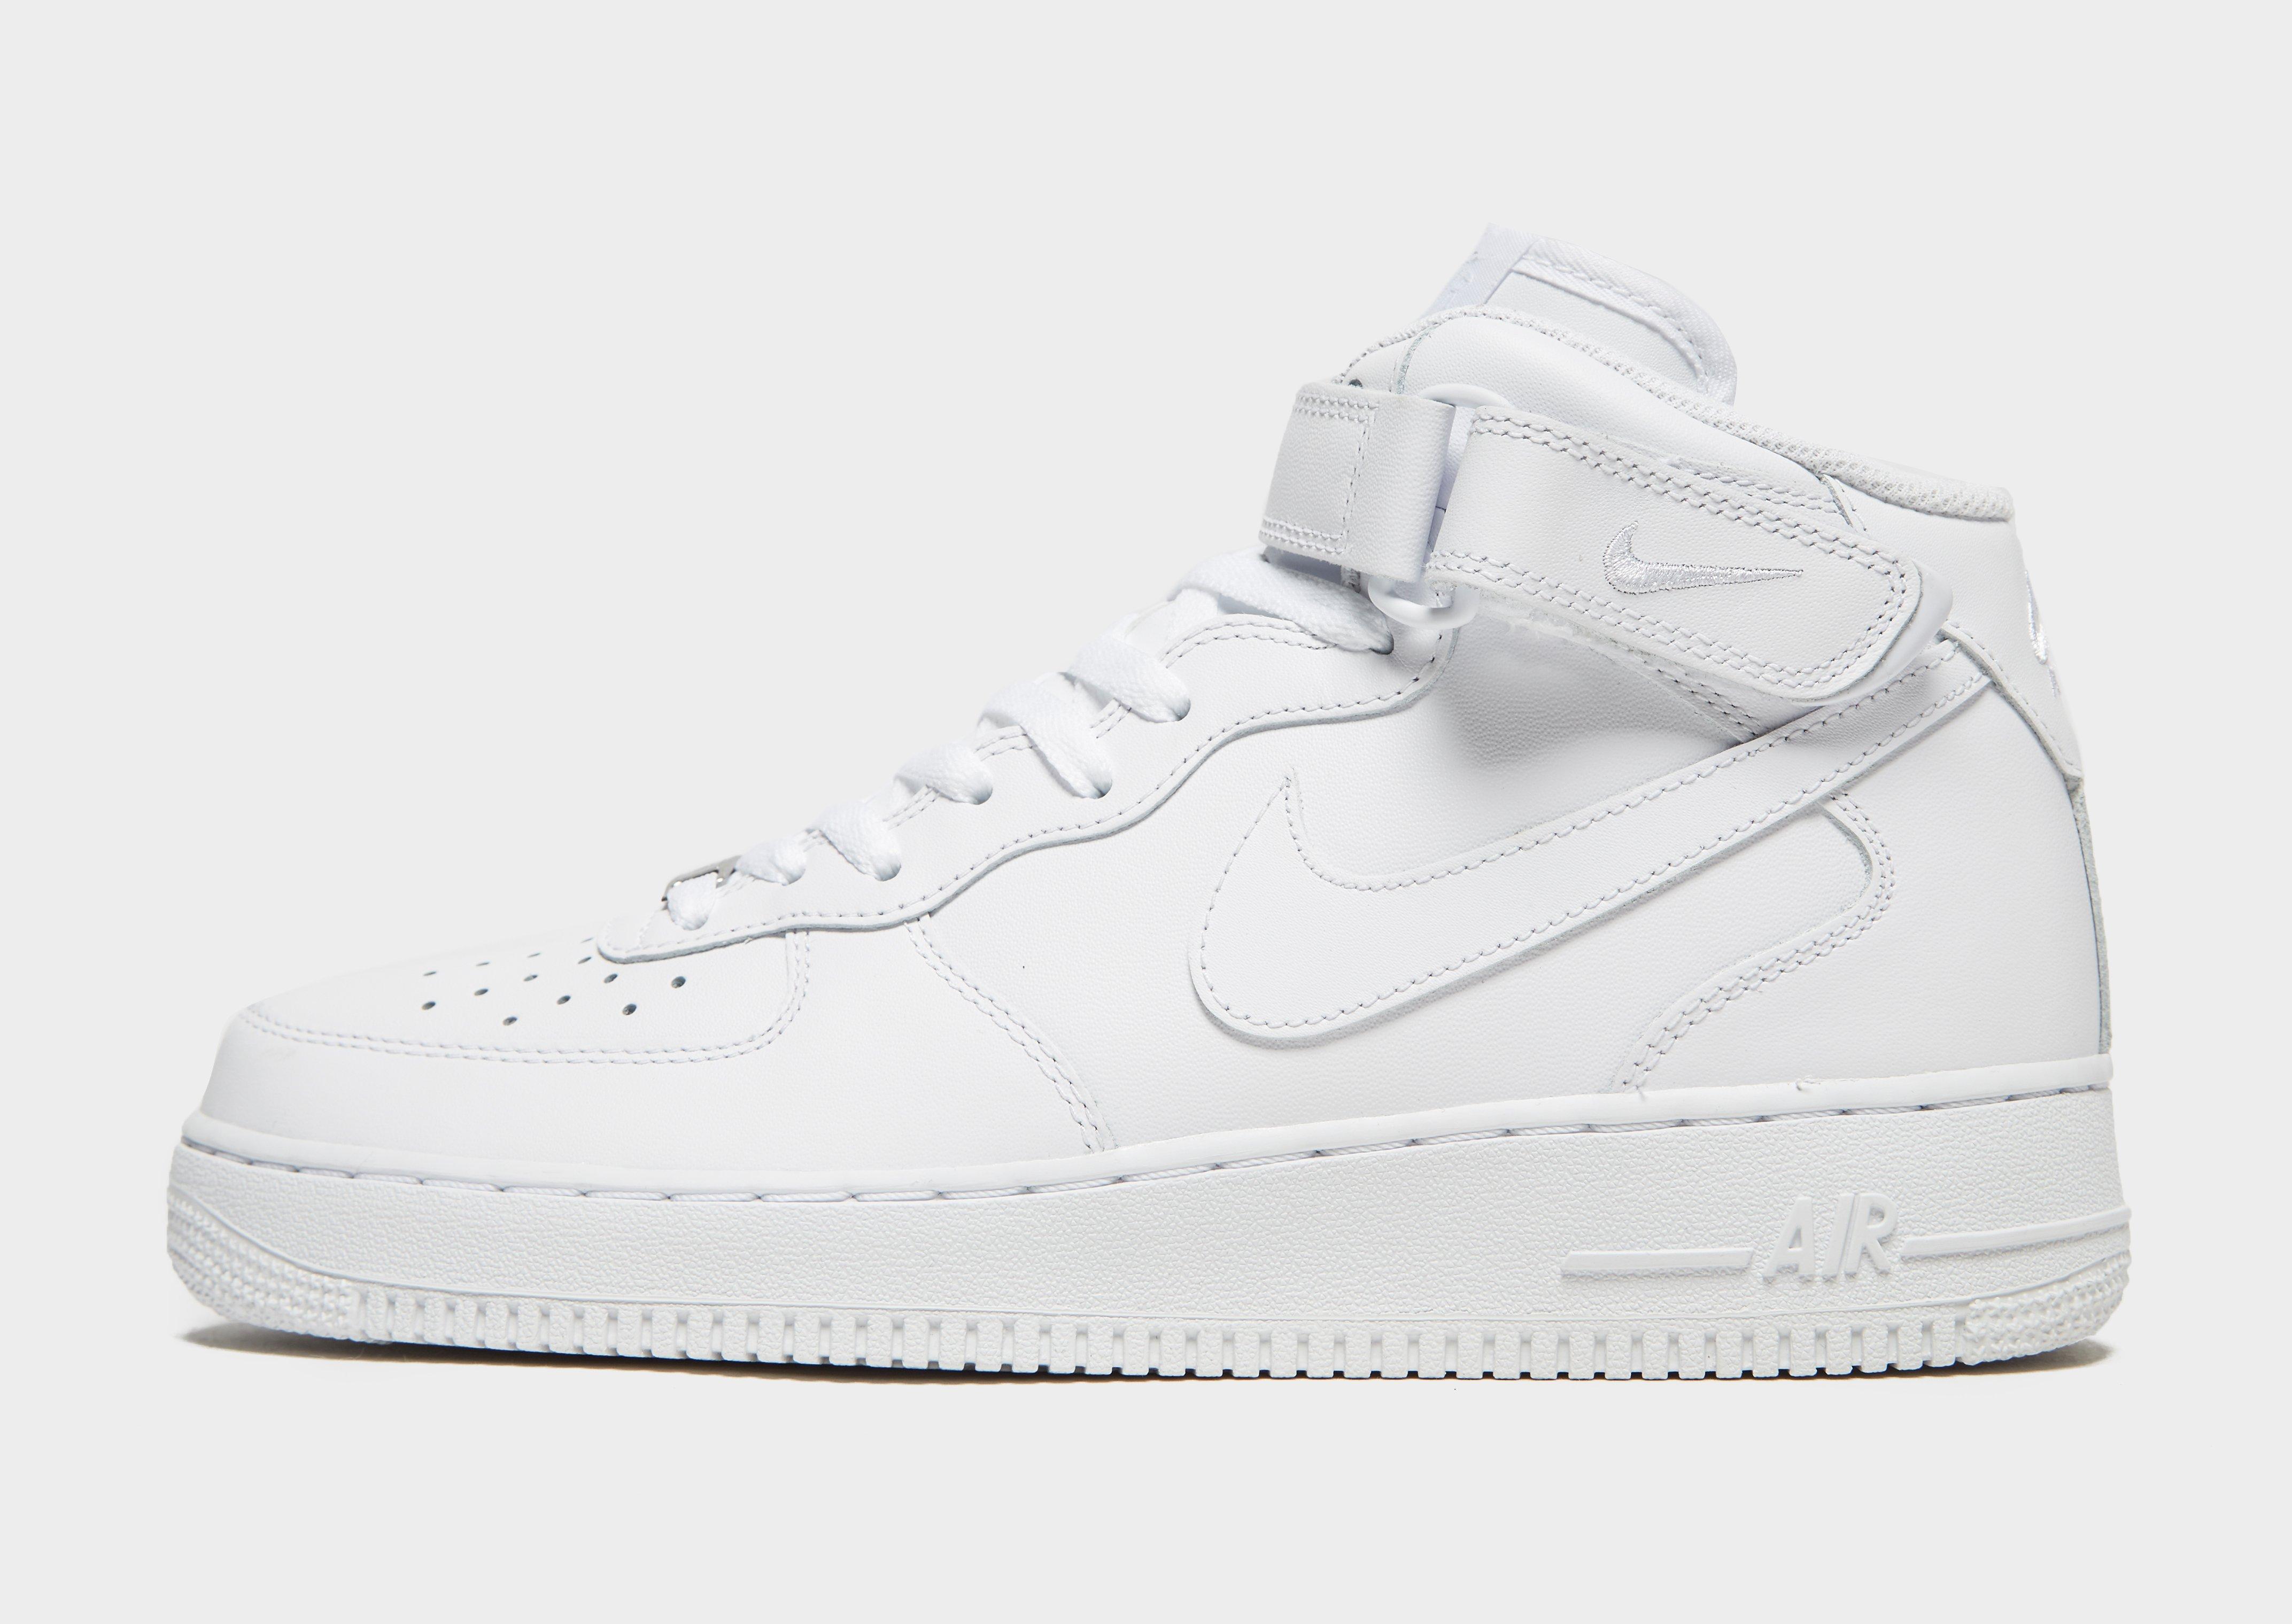 nike air force 1s high tops white converse